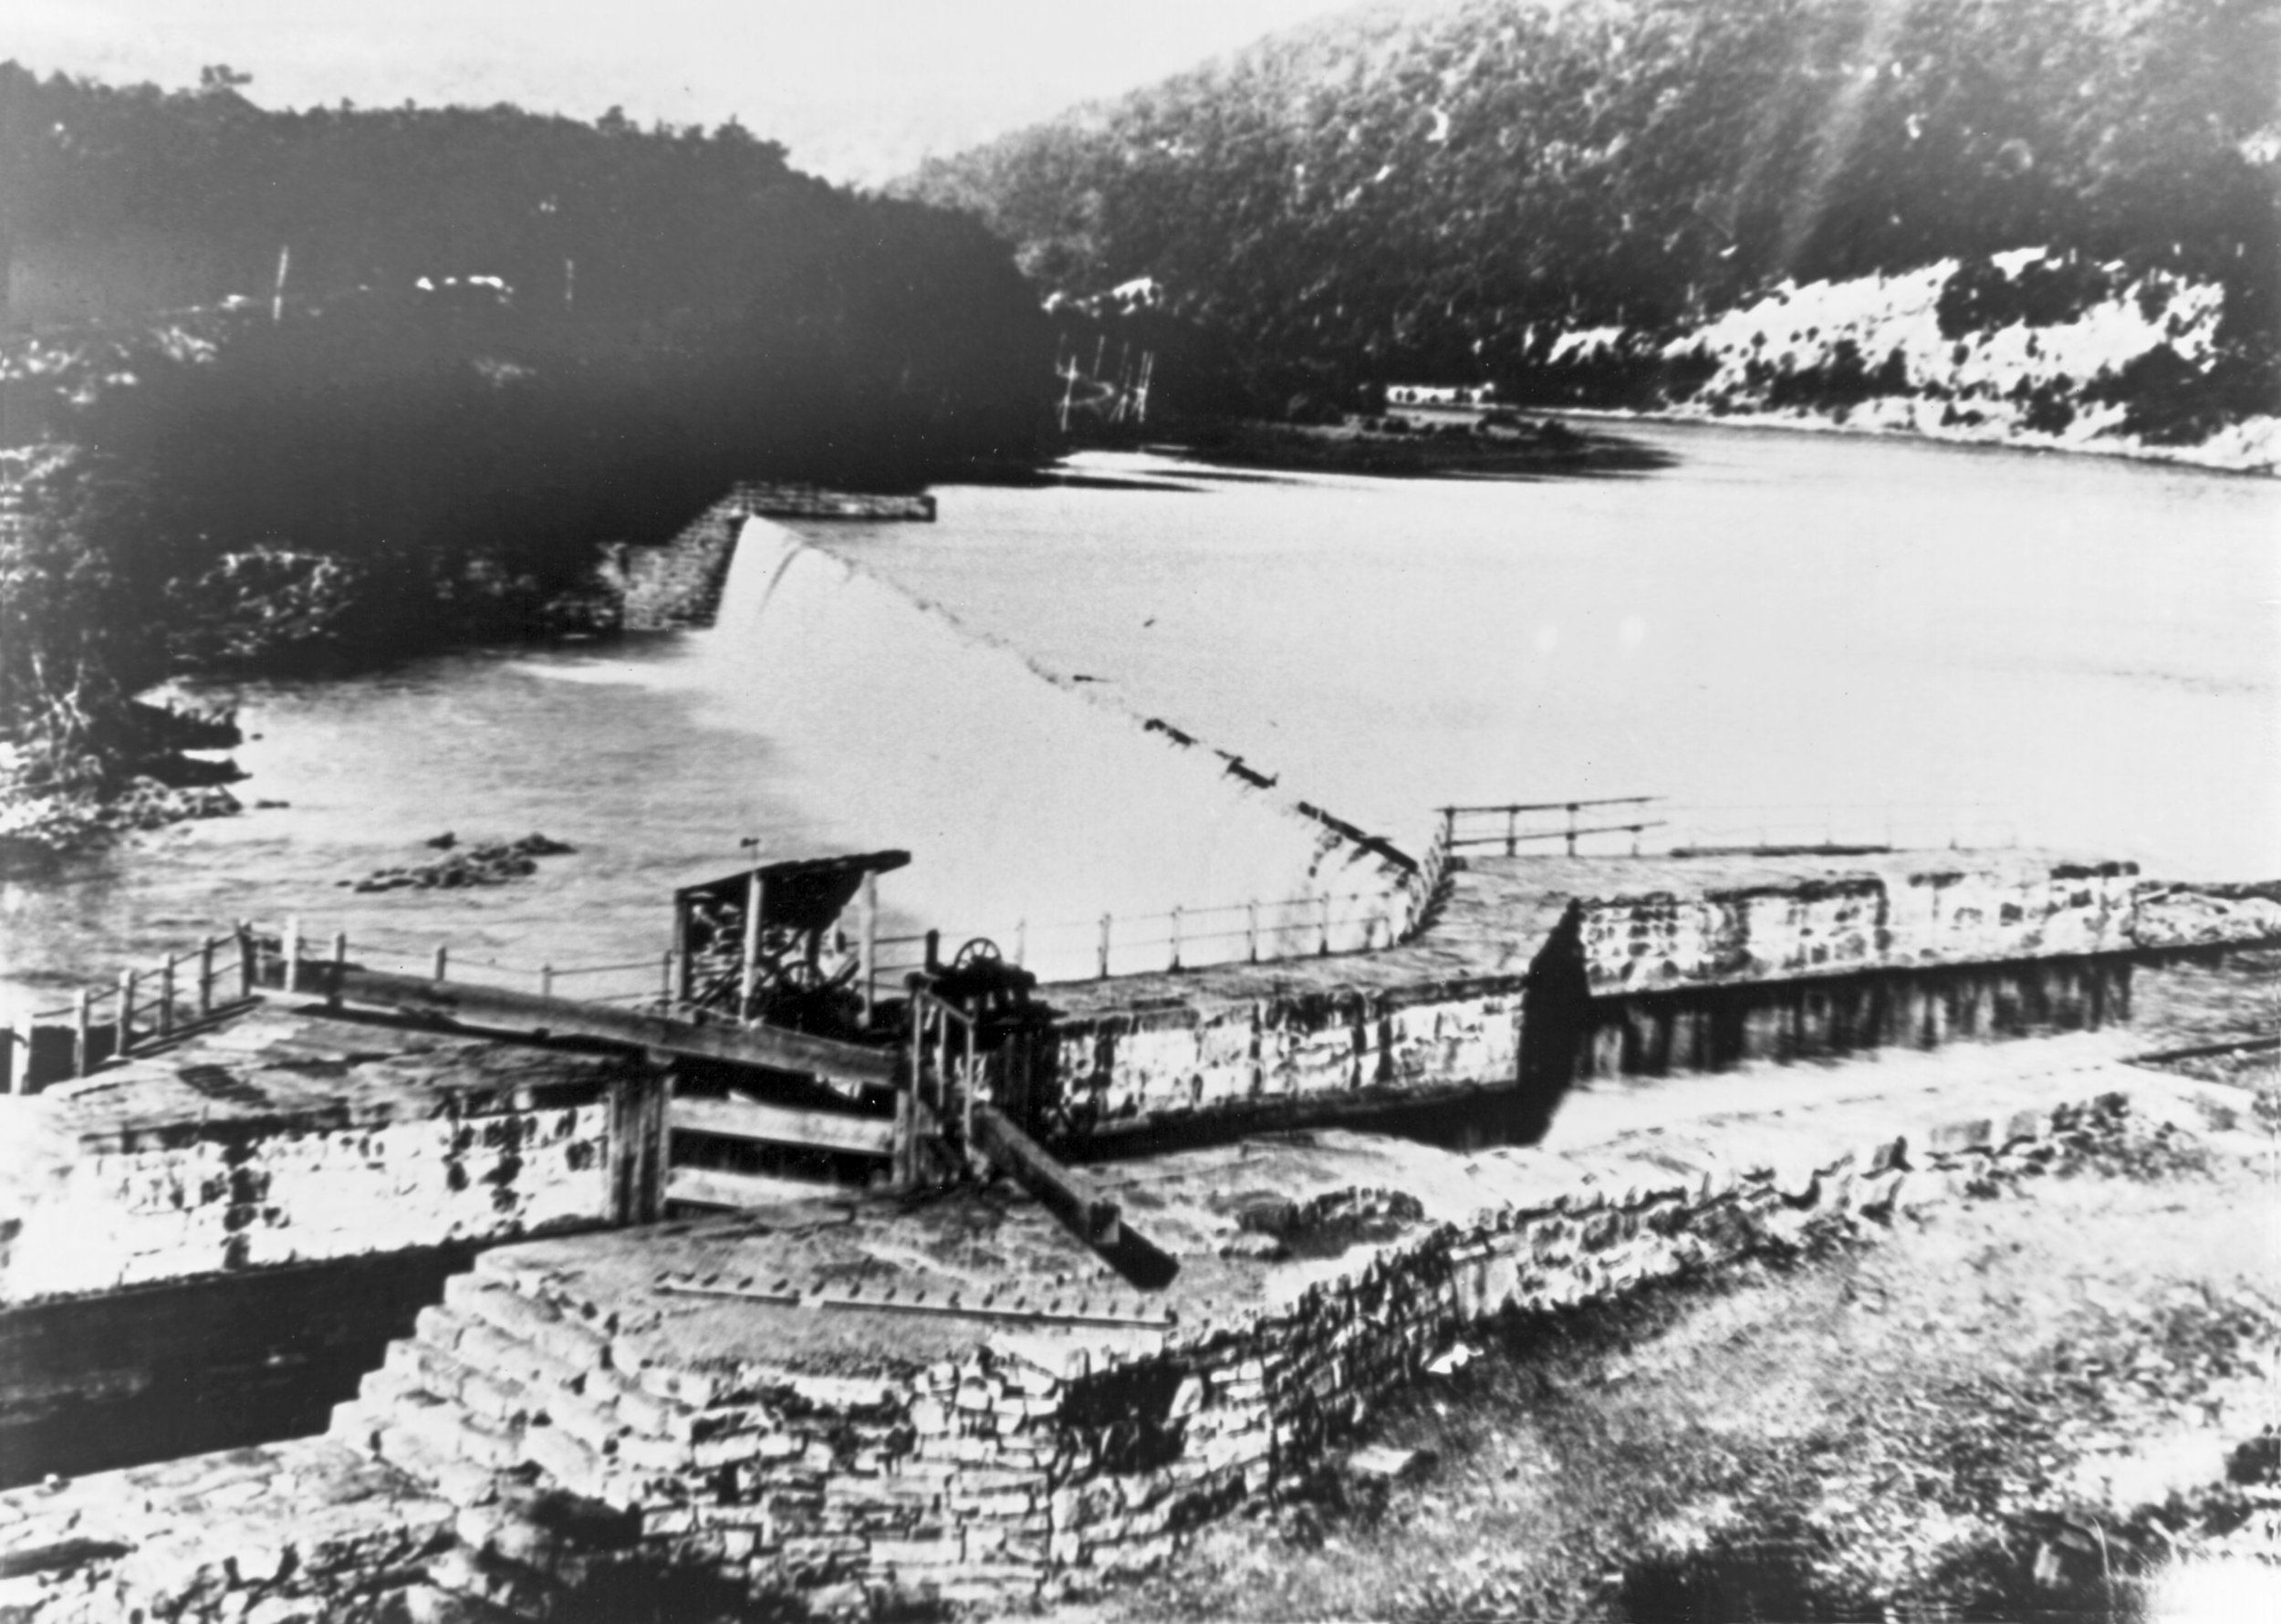 009 Big Blue Mountain Dam and Lock.jpg